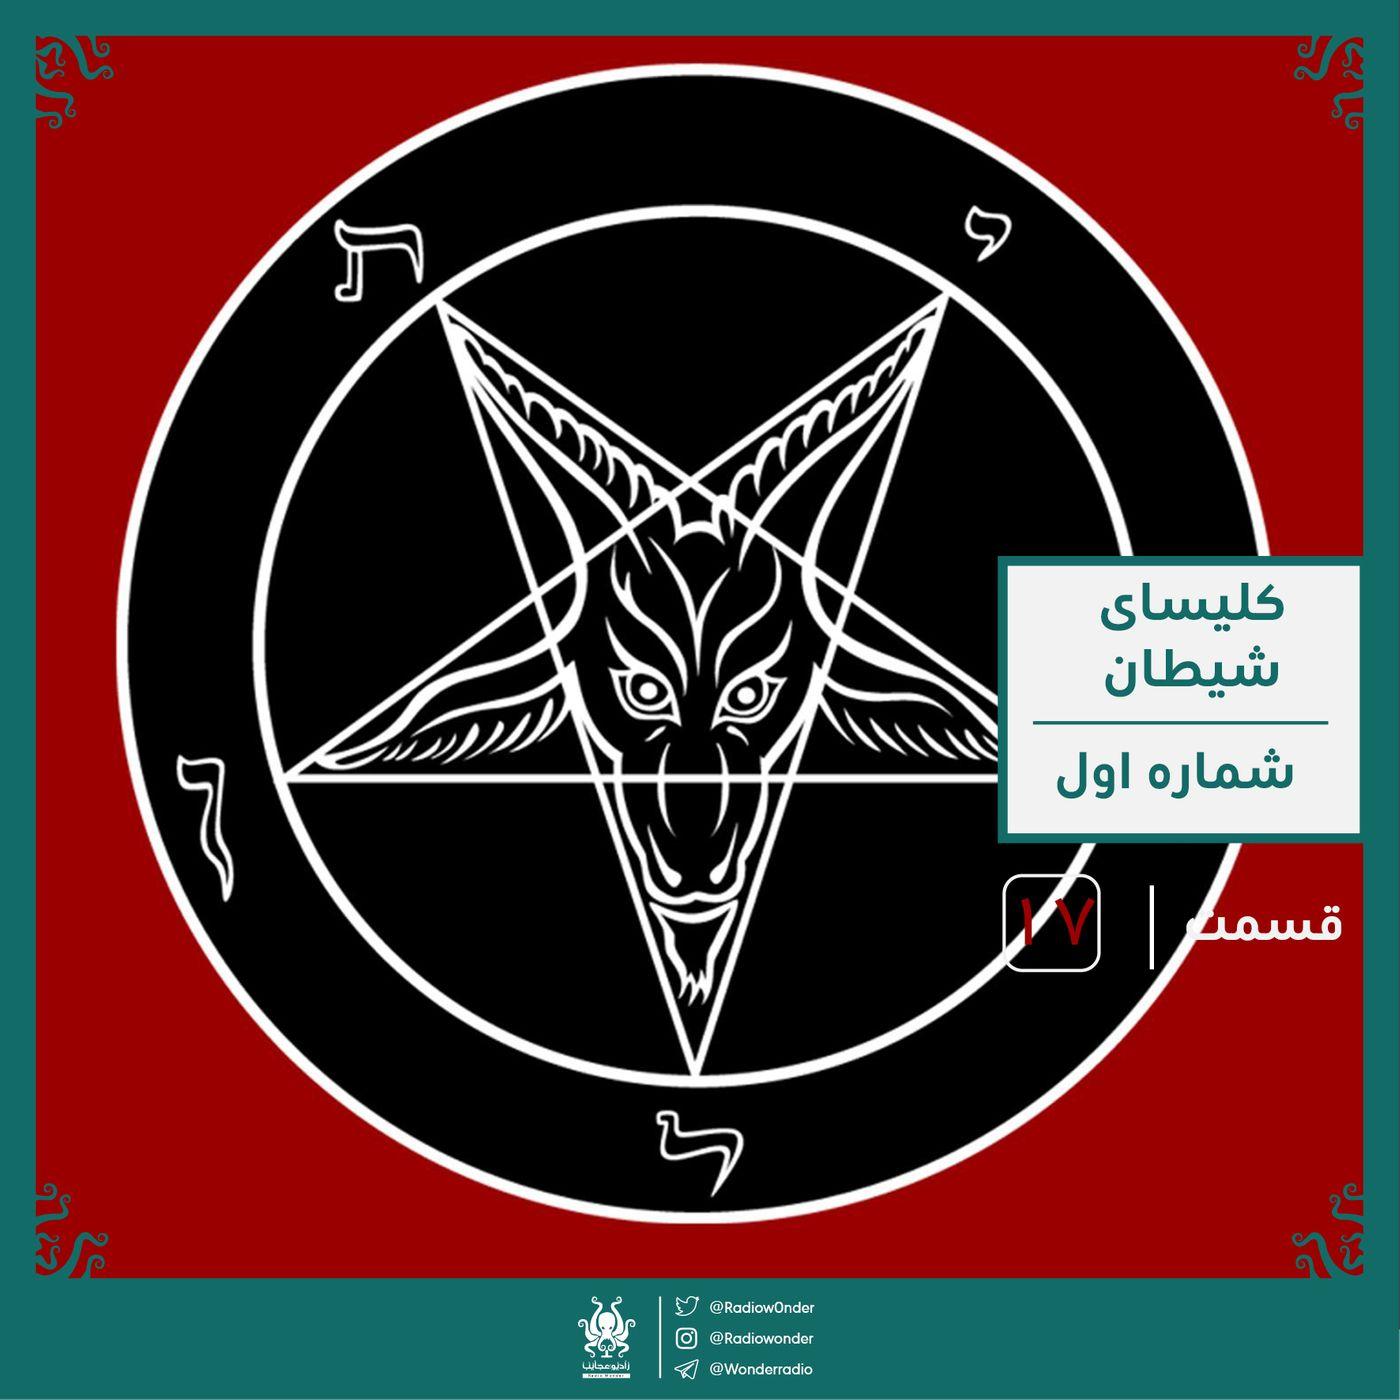 کلیسای-شیطان